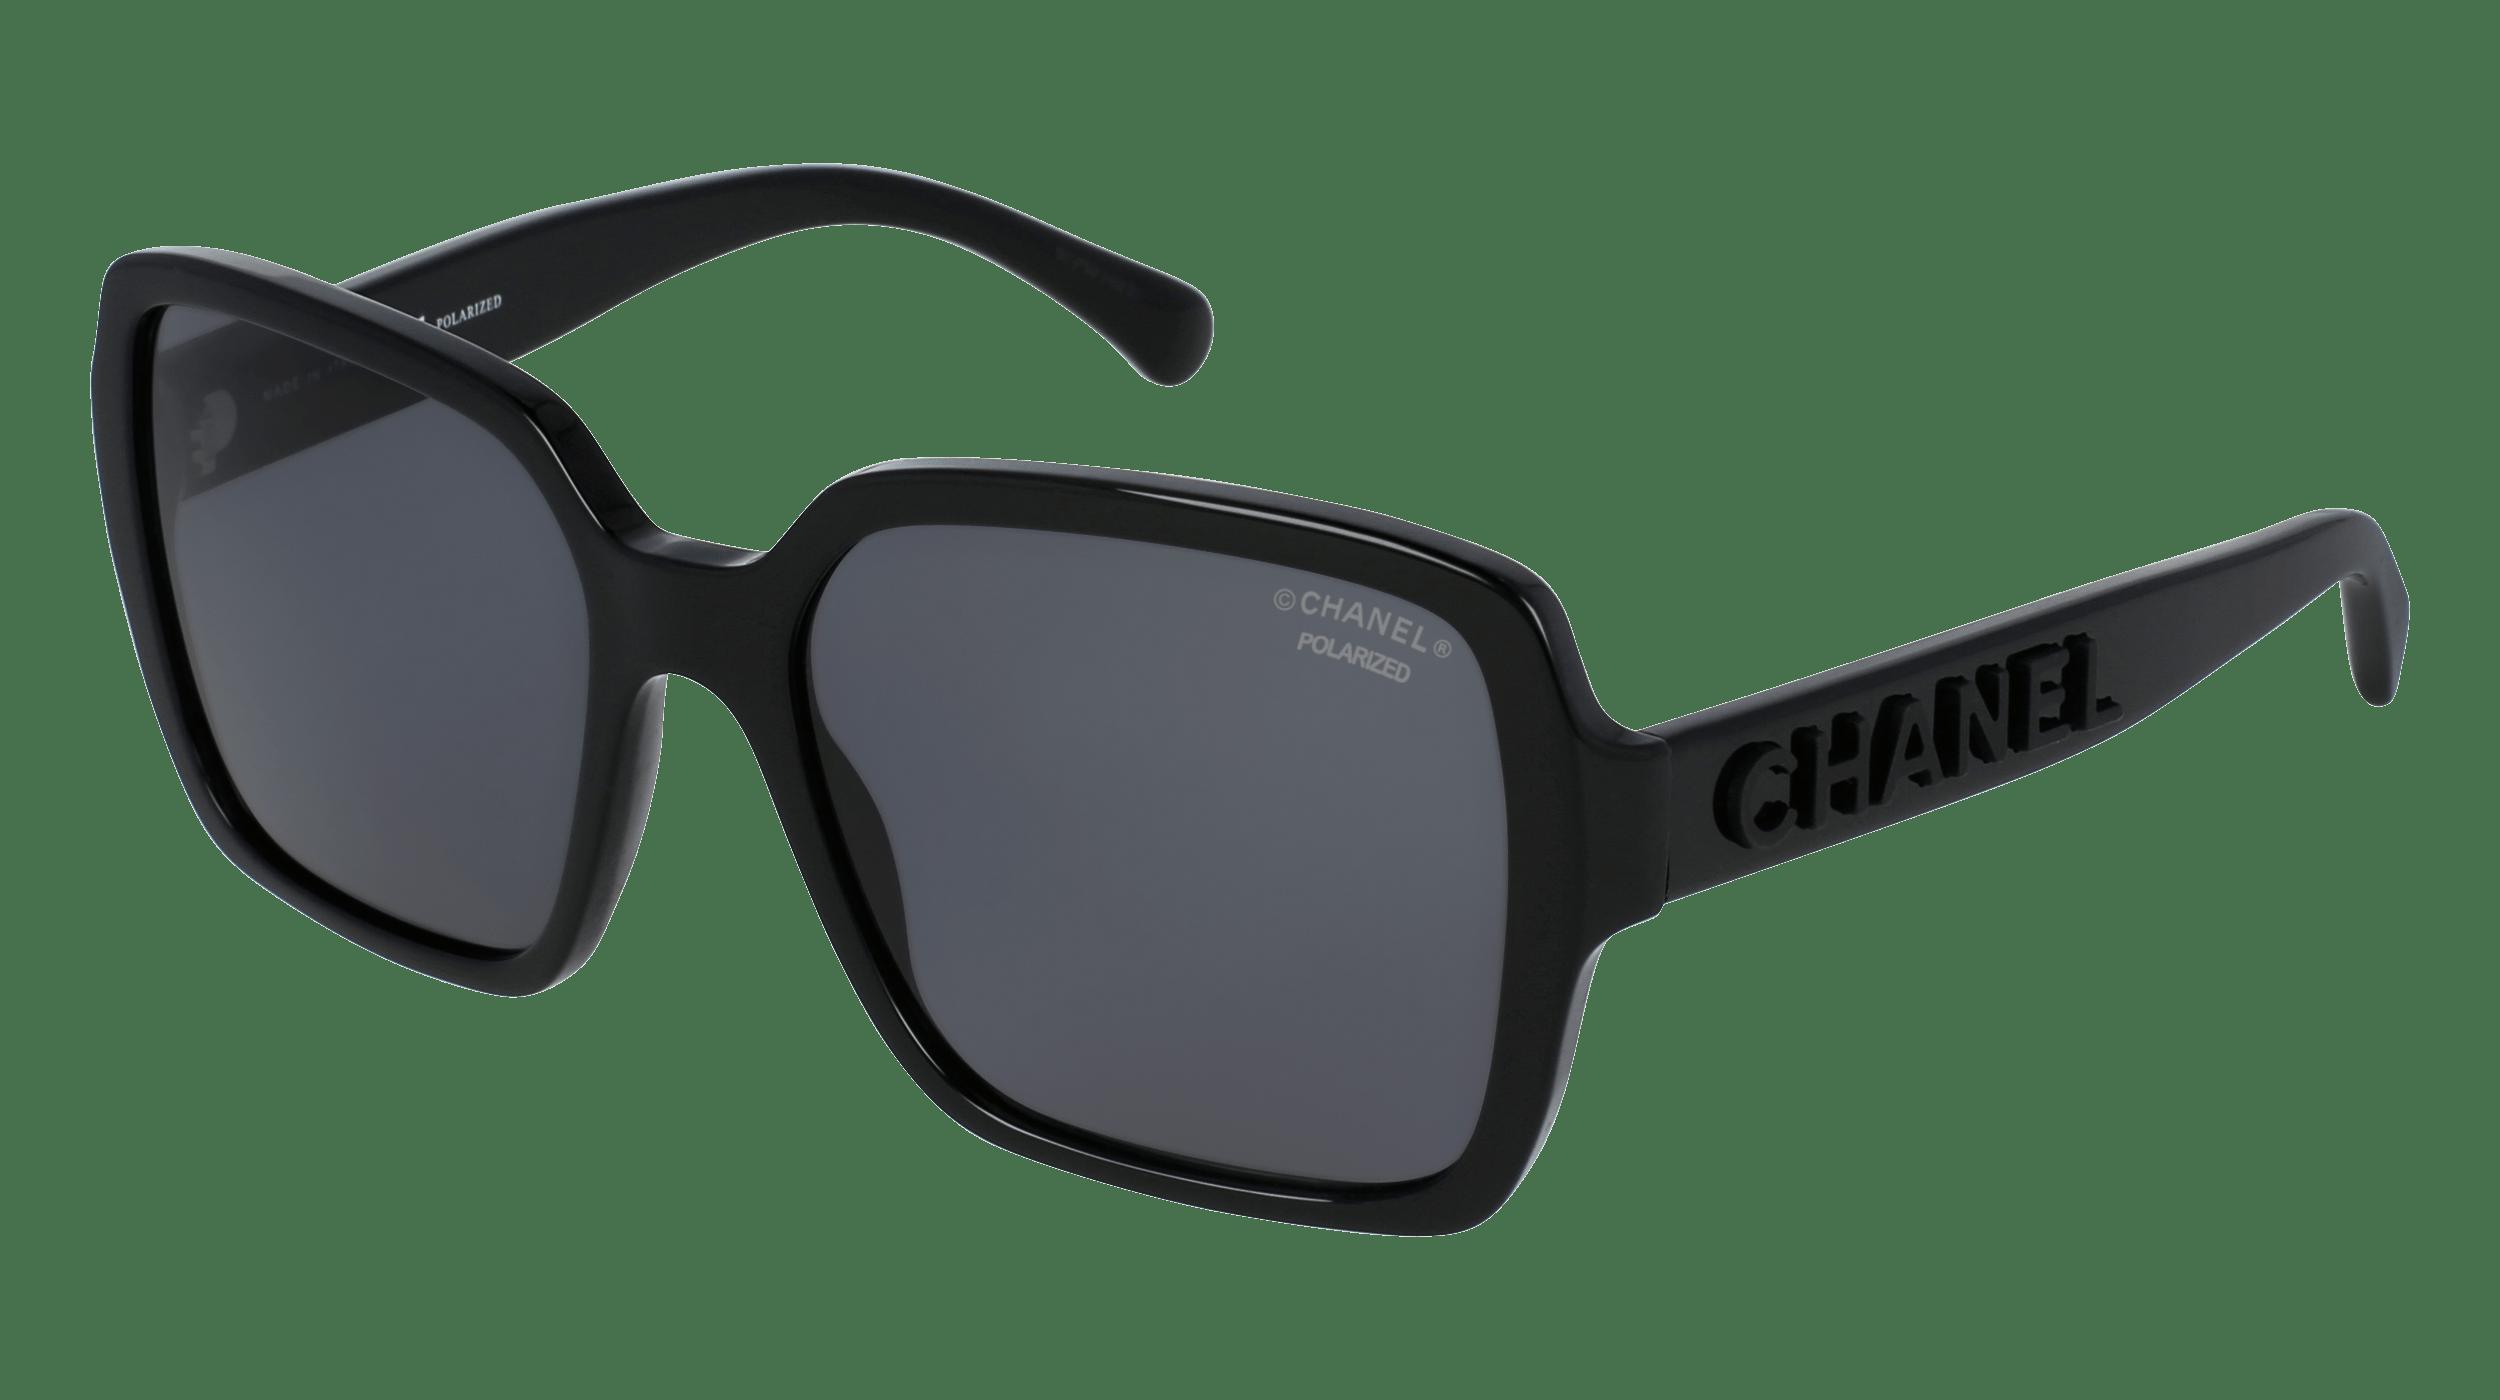 Chanel-CH5408